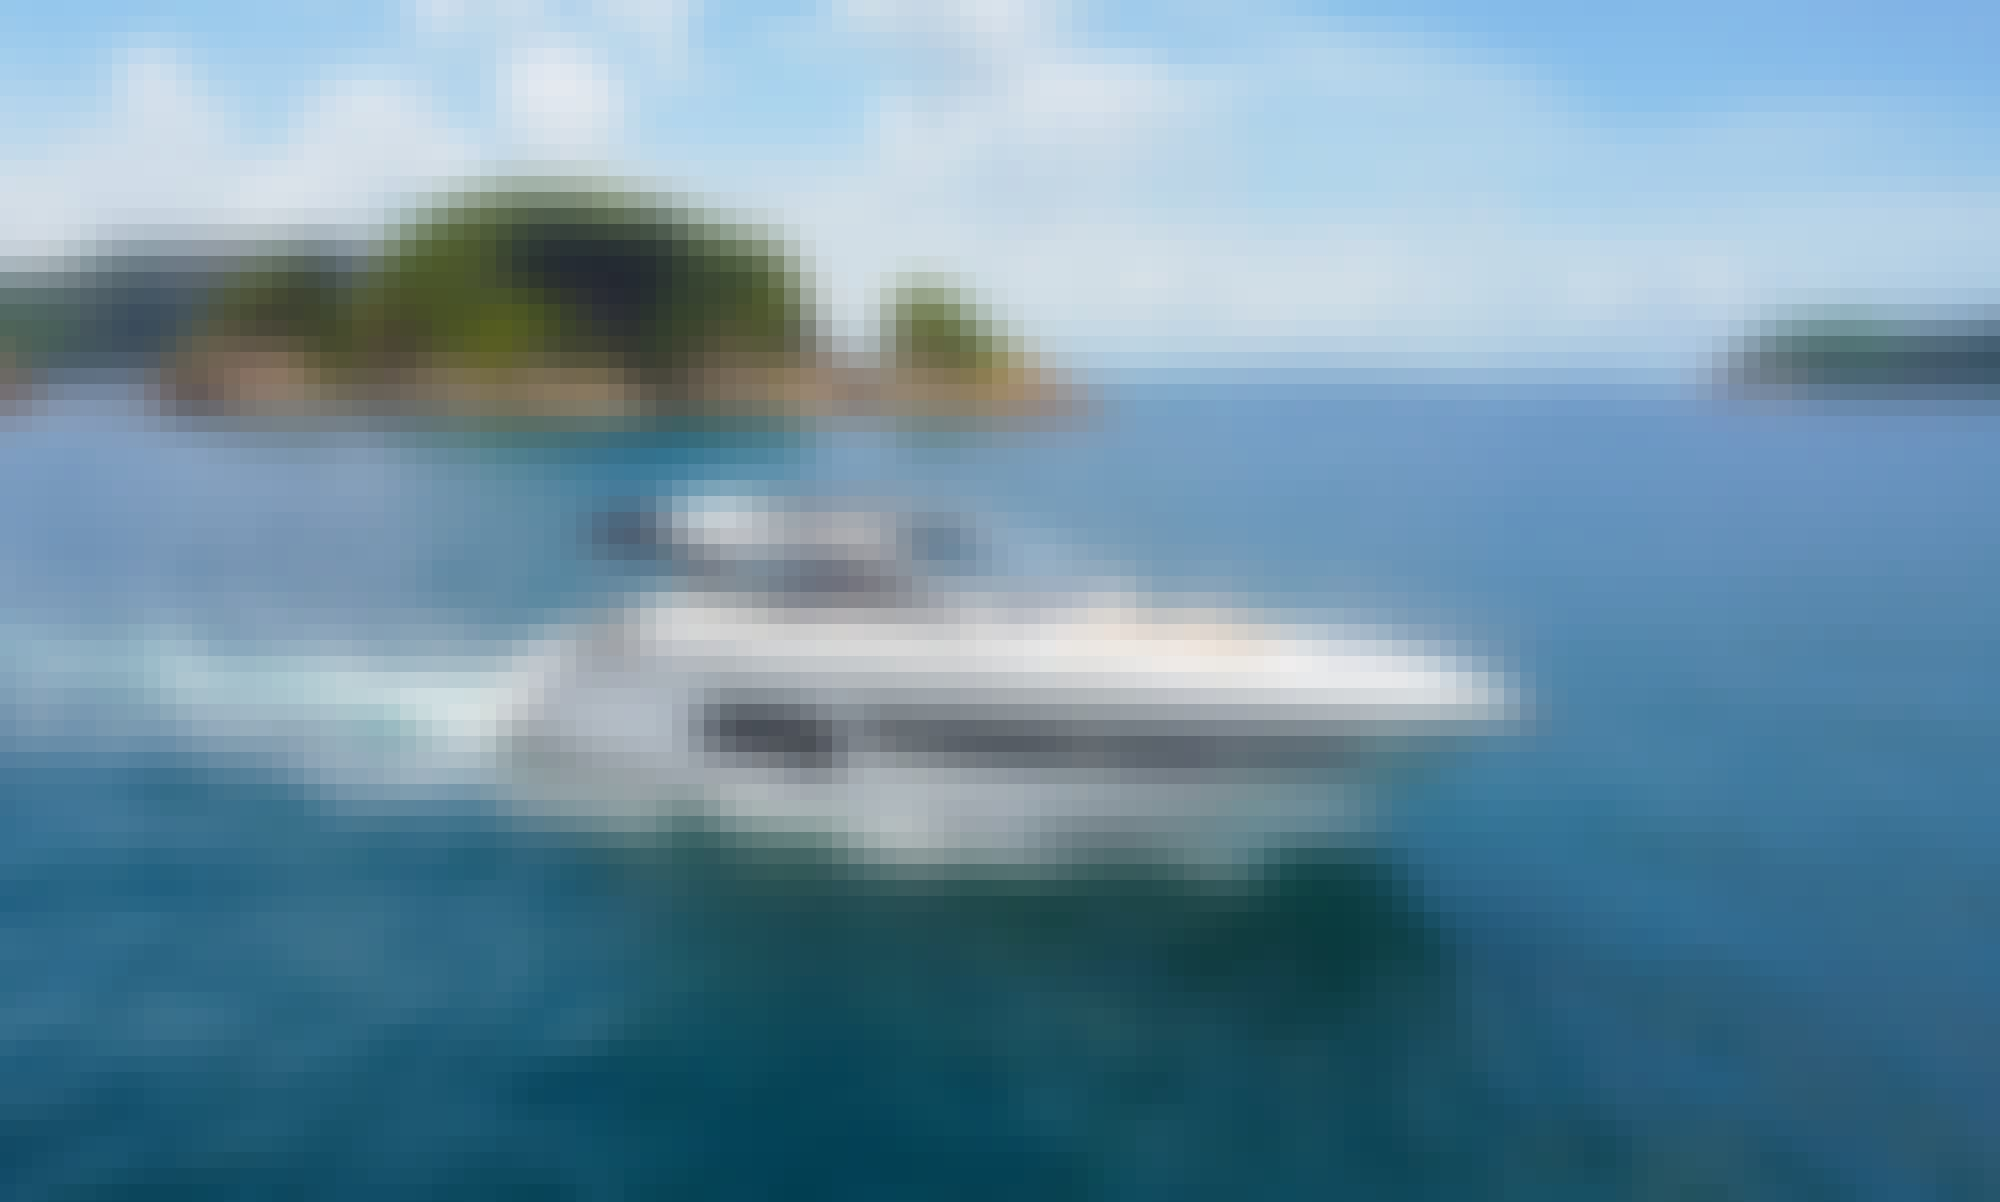 Book the Azimut Atlantis 43 Motor boat in Hong Kong Island!